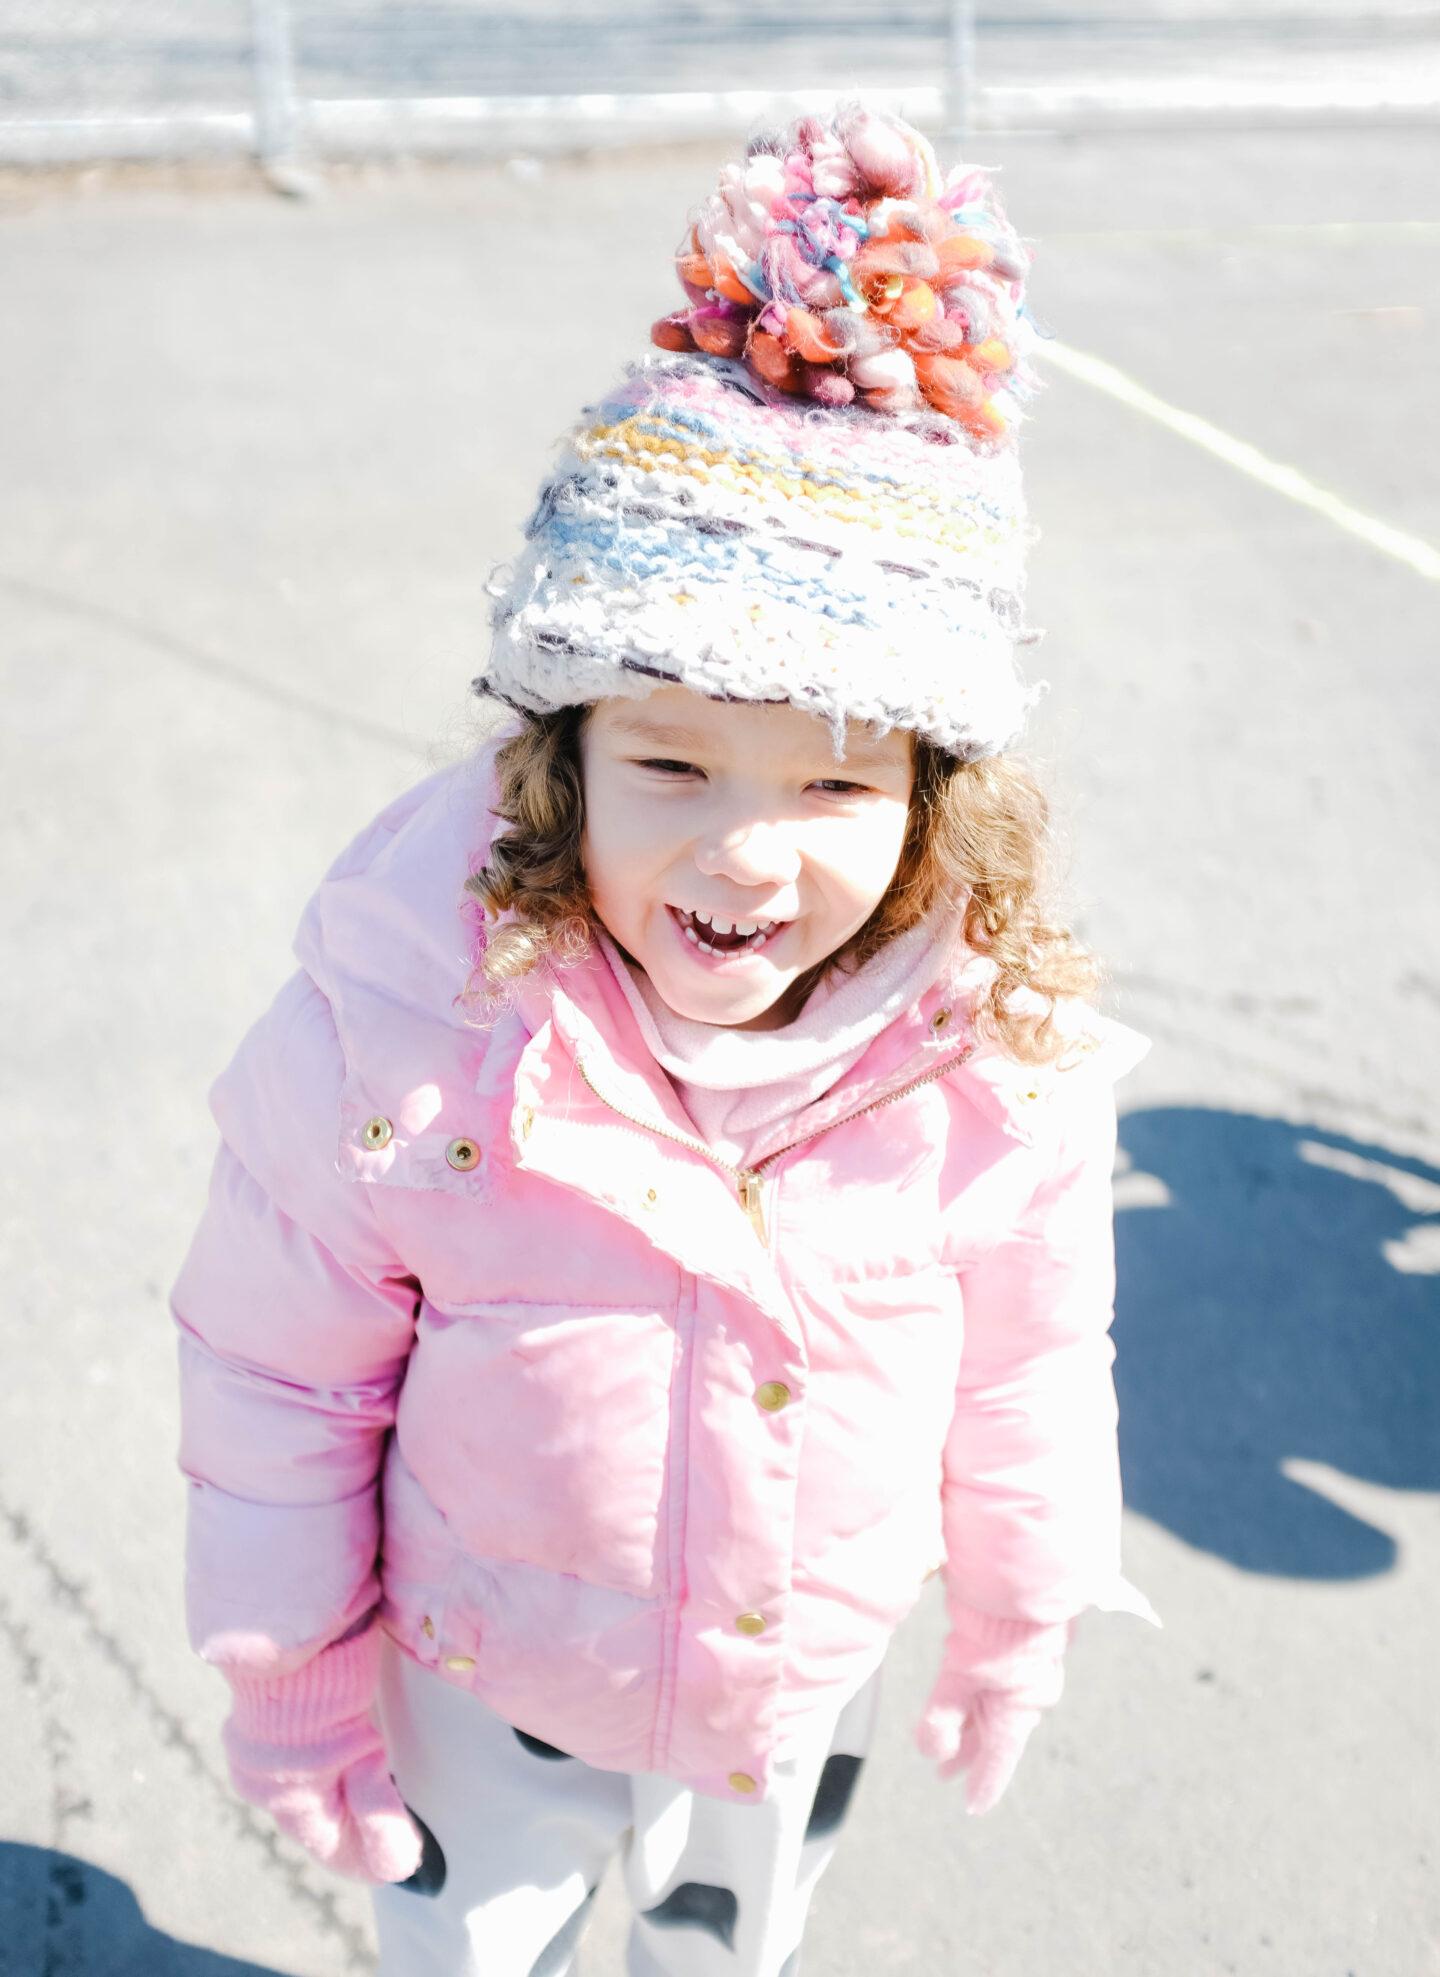 Quaratine Tips with Kids